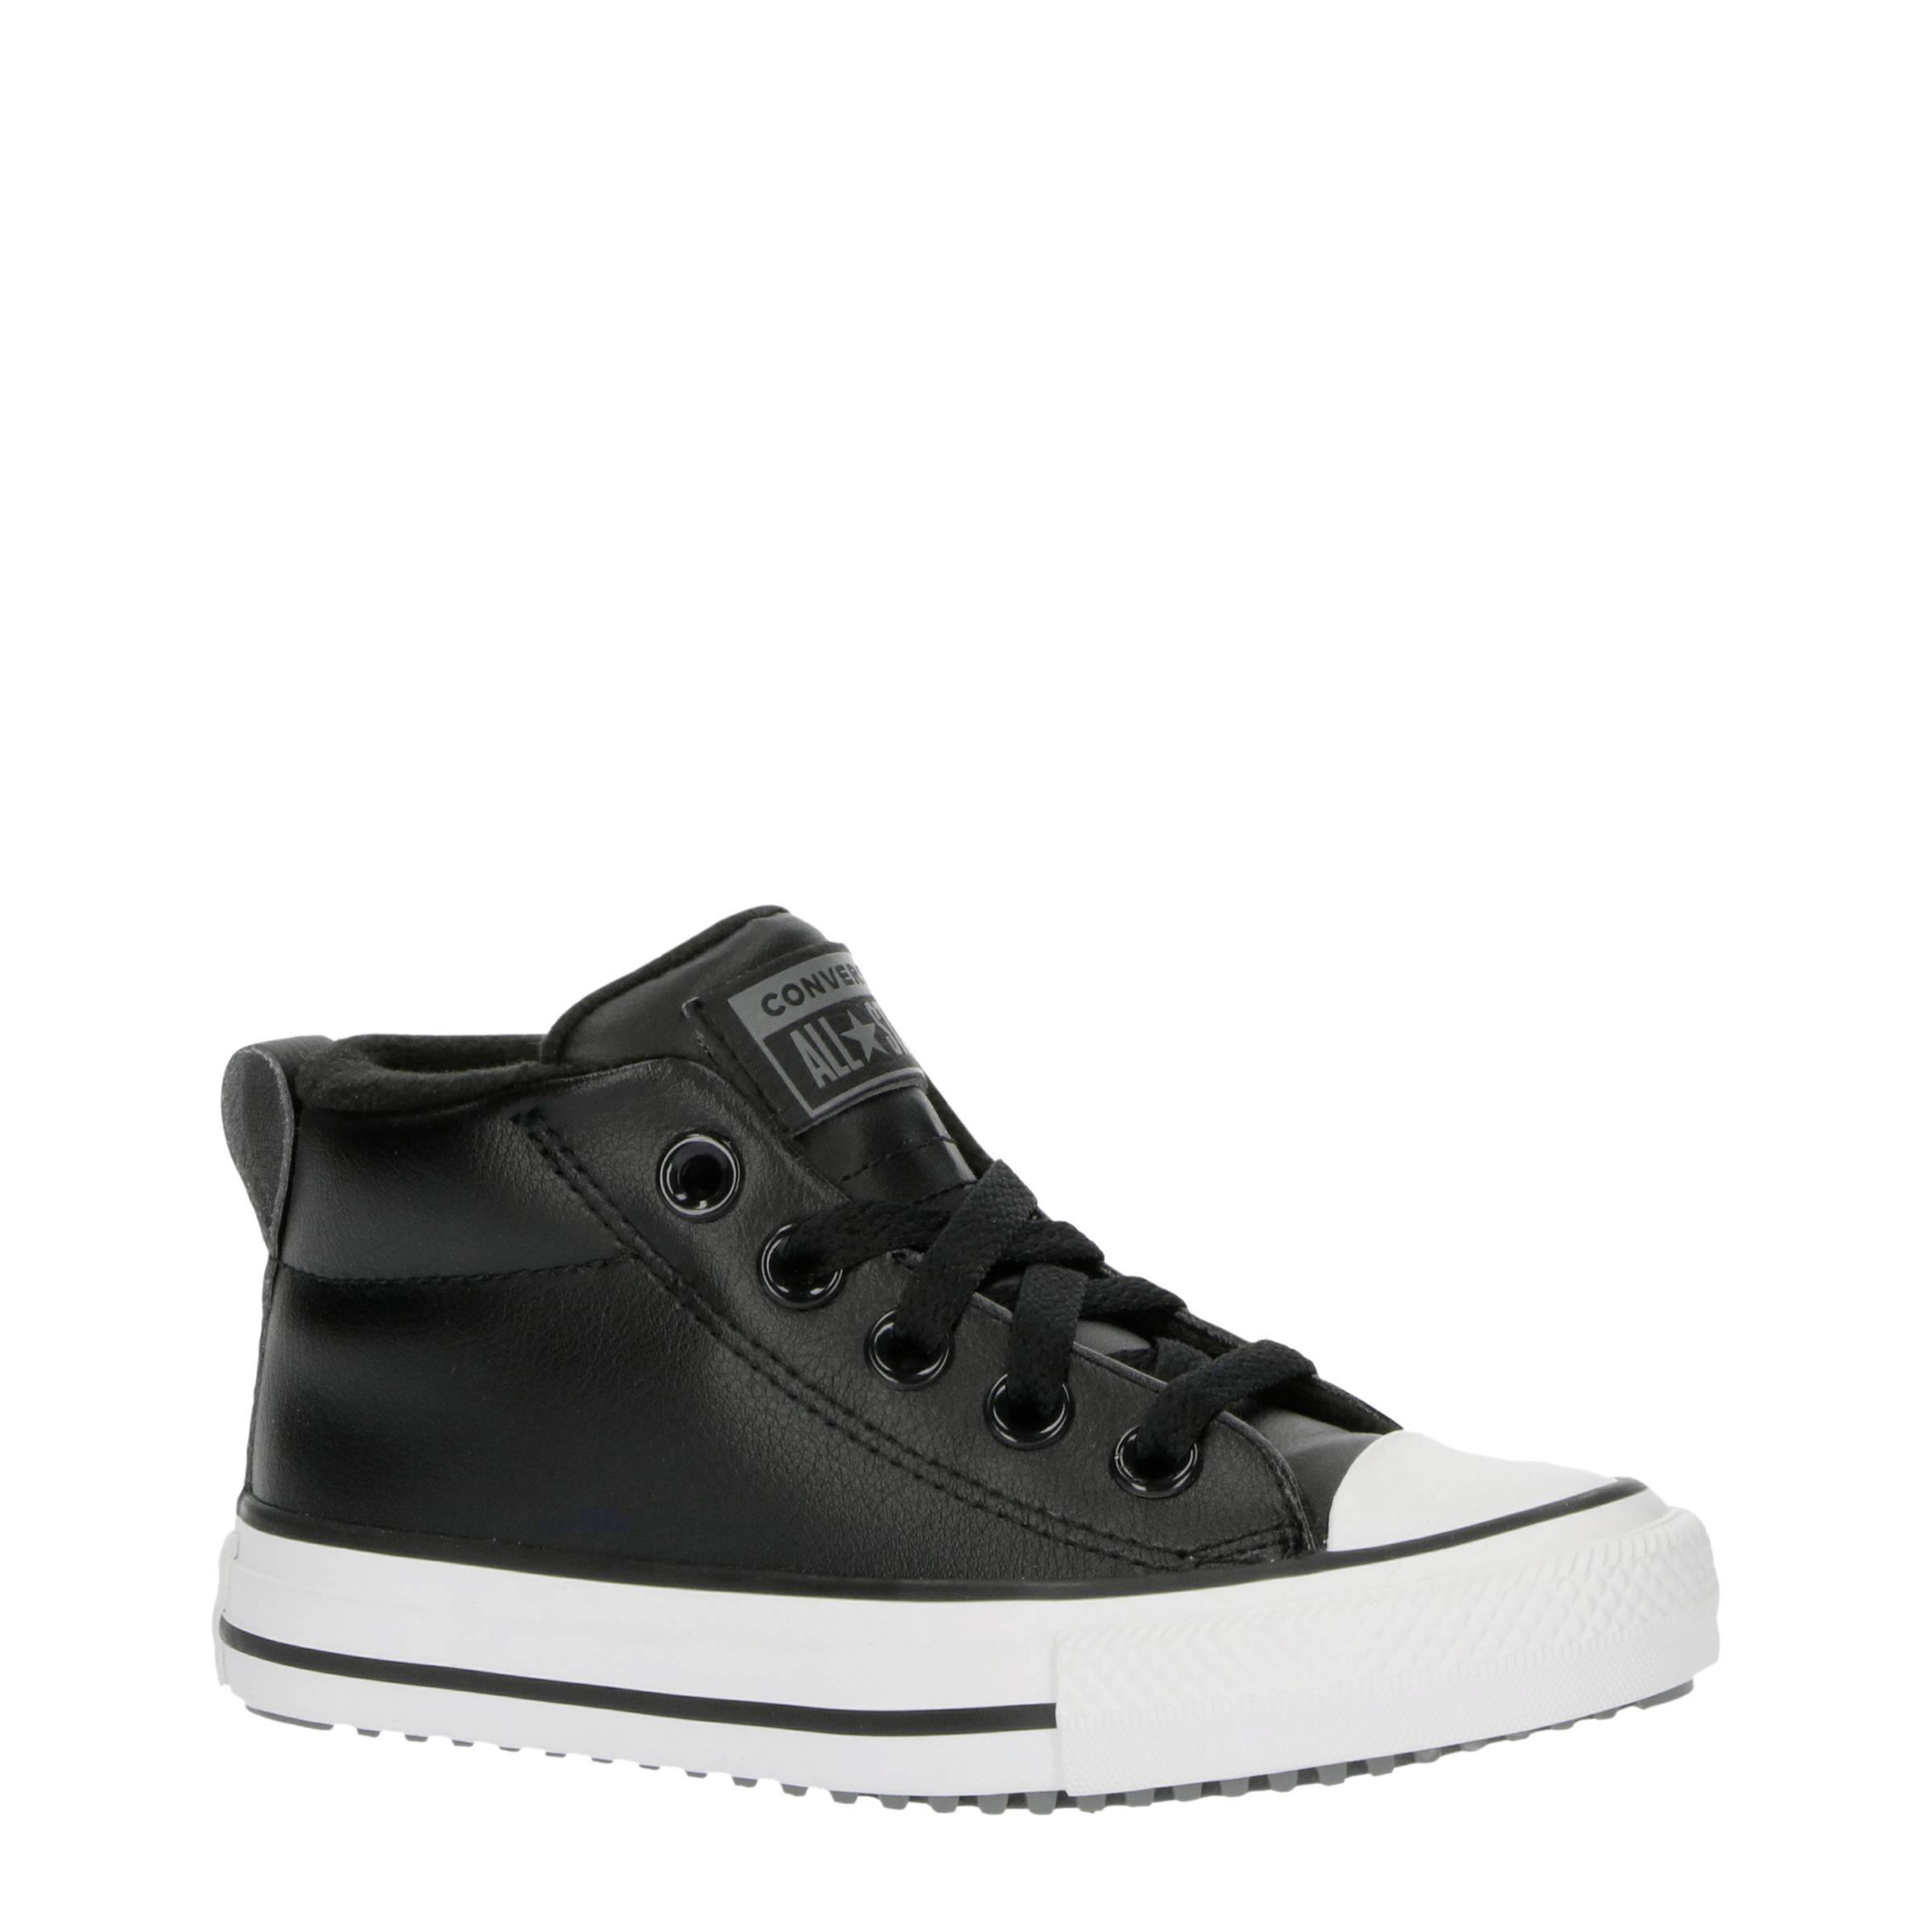 Converse Chuck Taylor All Star Street Boot halfhoge leren ...